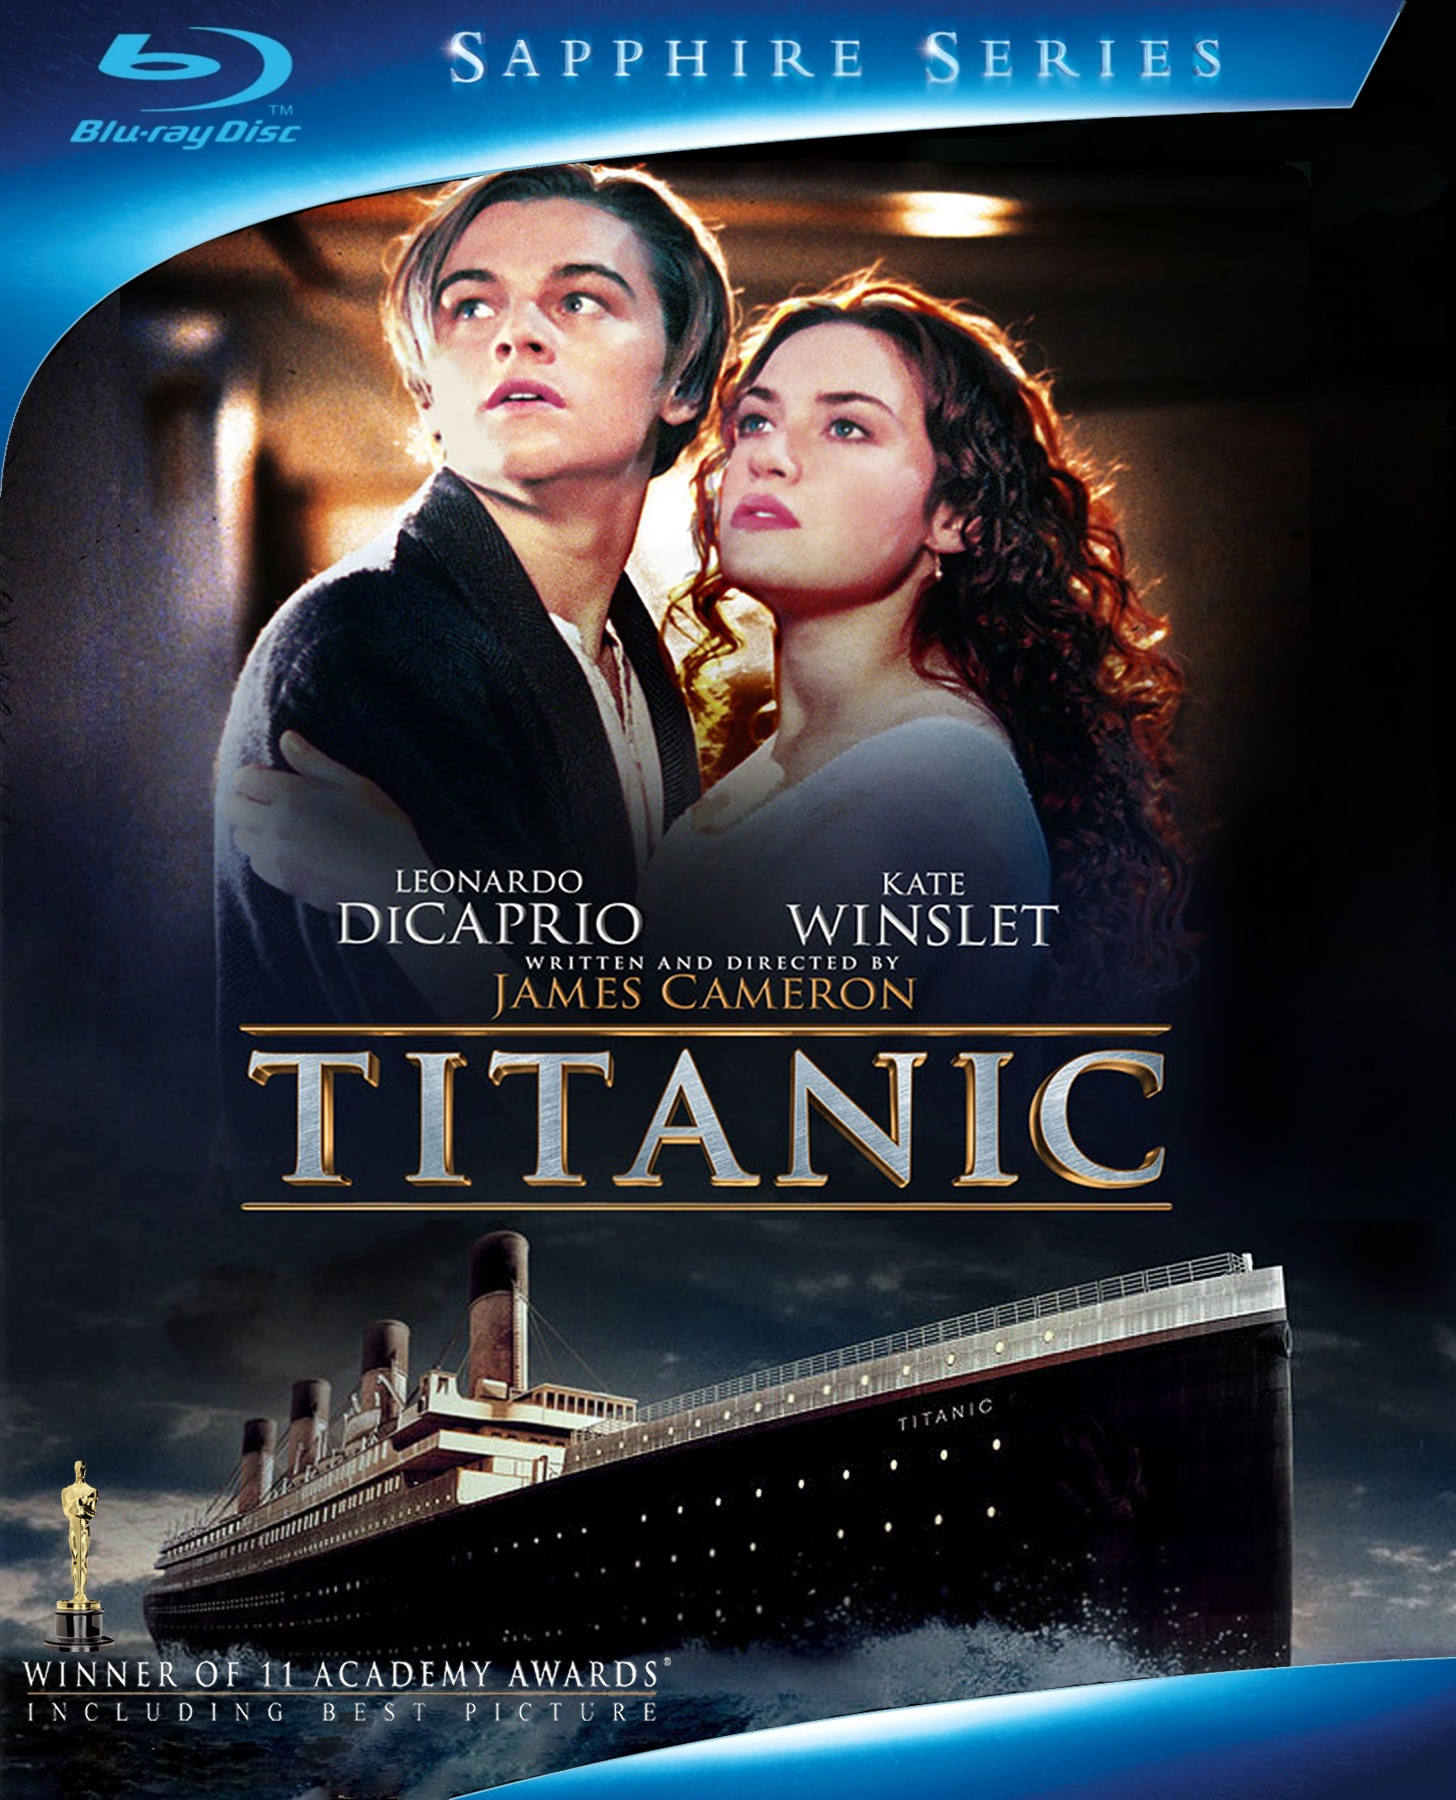 Titanic Movie: Titanic (1997) Sapphire Series Movies Box Art Cover By